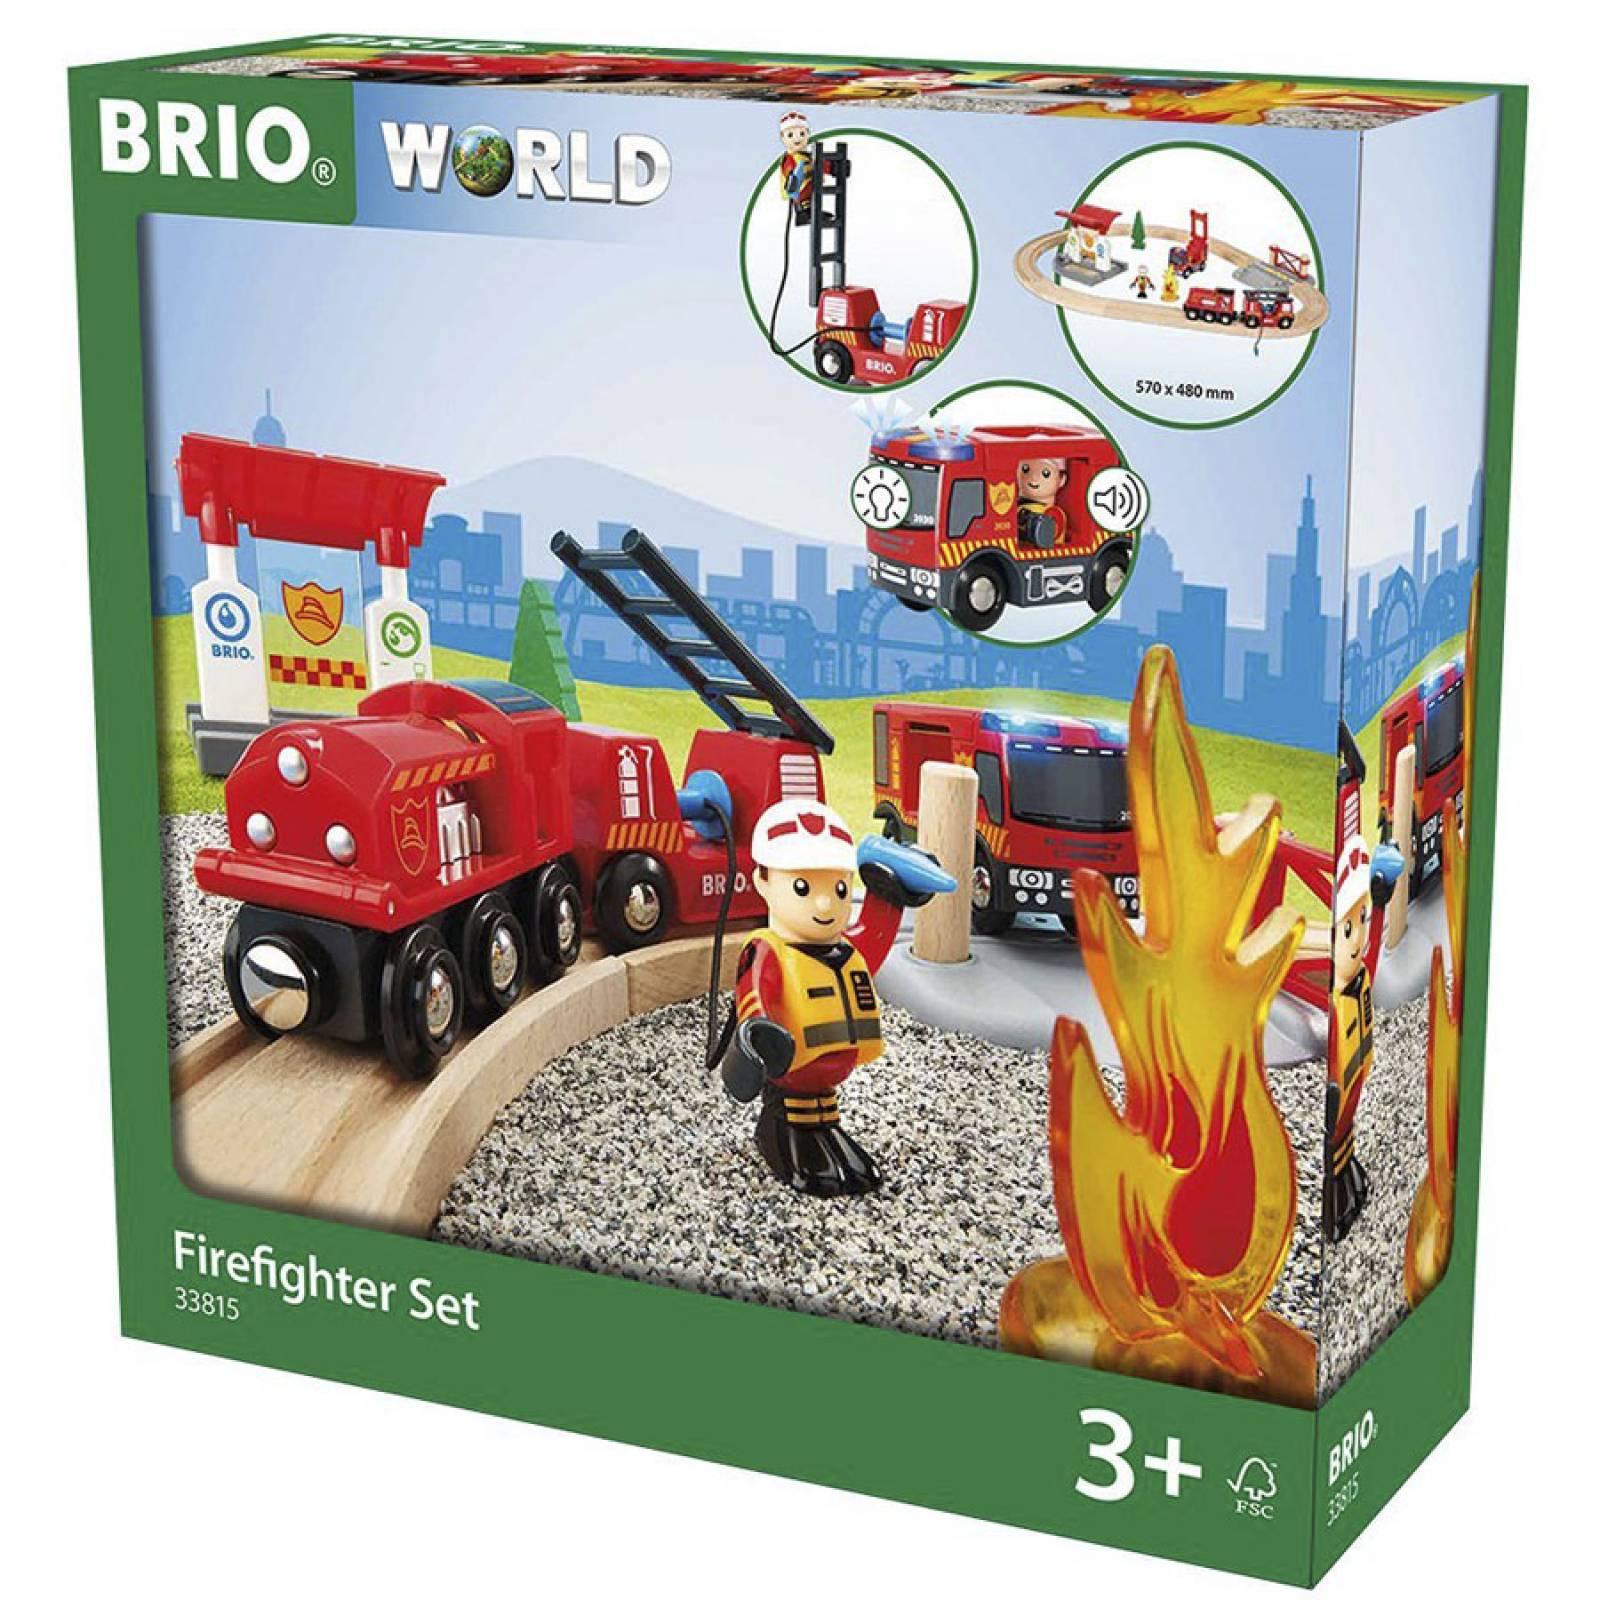 Firefighter Set BRIO Wooden Railway Age 3+ thumbnails